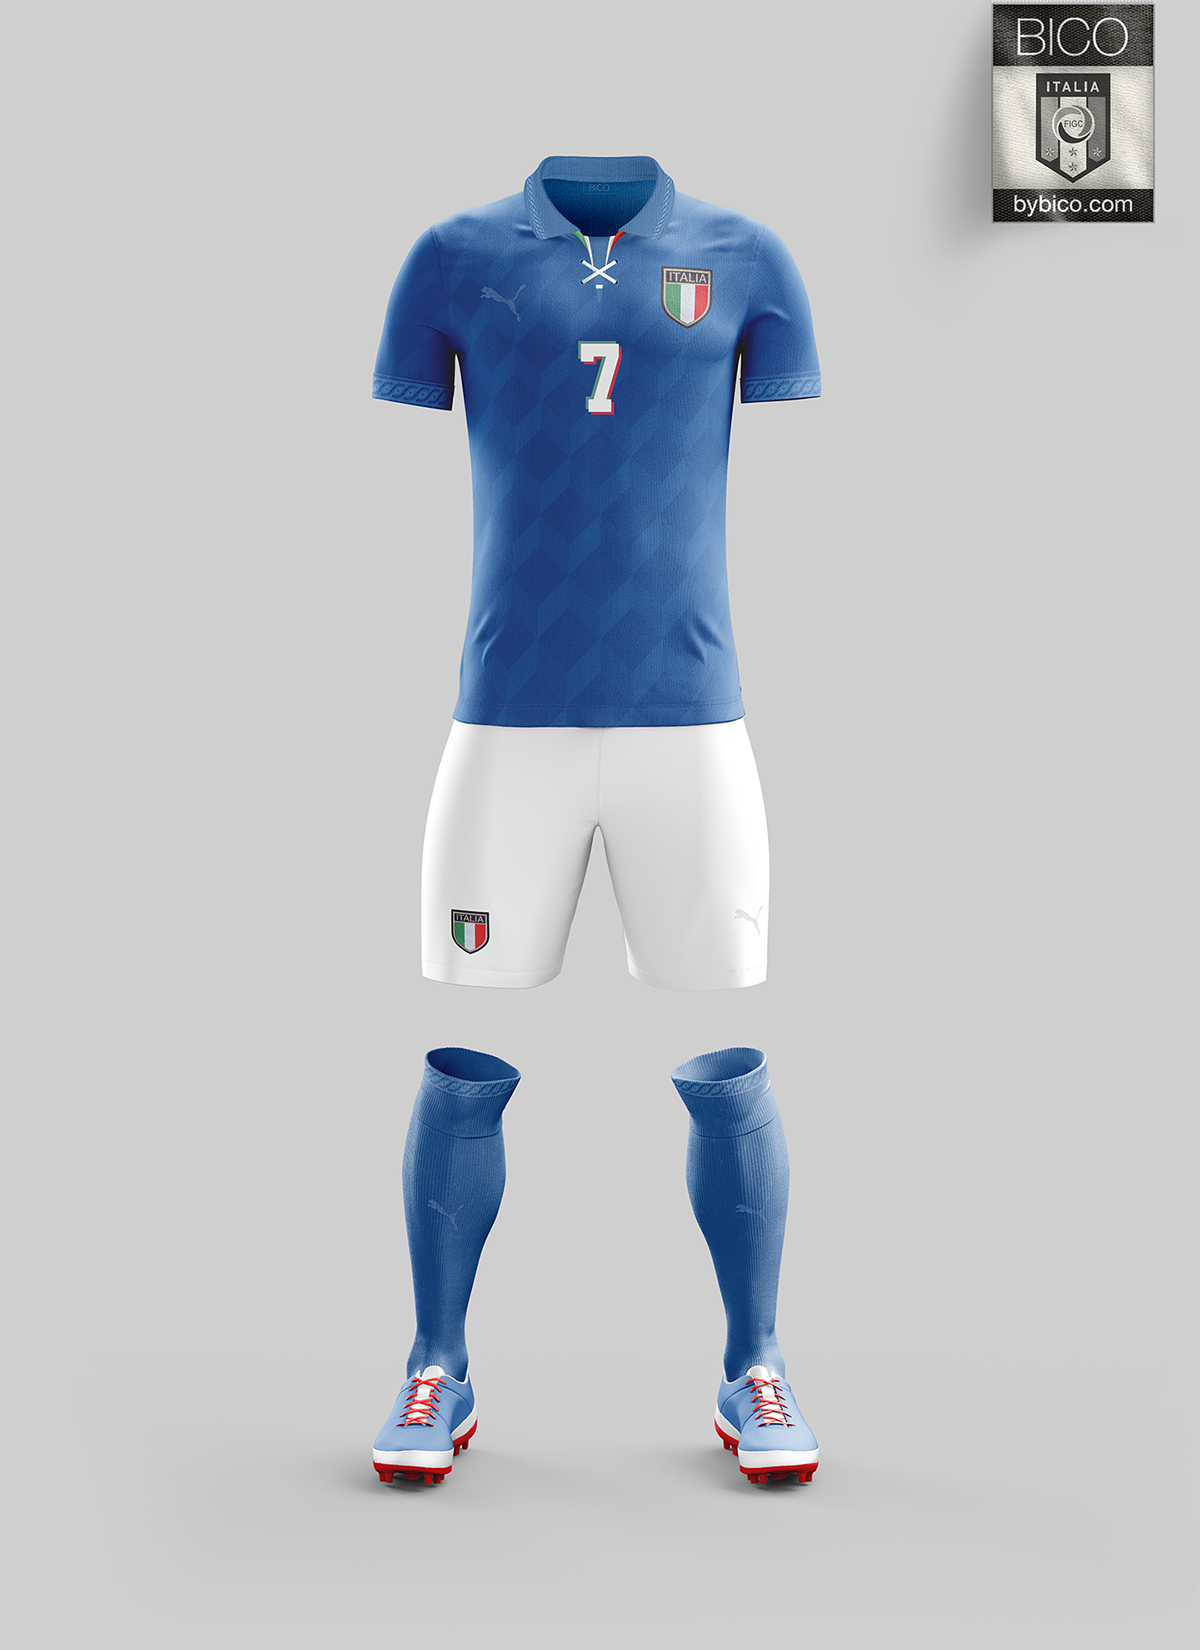 Italy Kit On Behance Football Team Kits Football Uniforms Soccer Kits